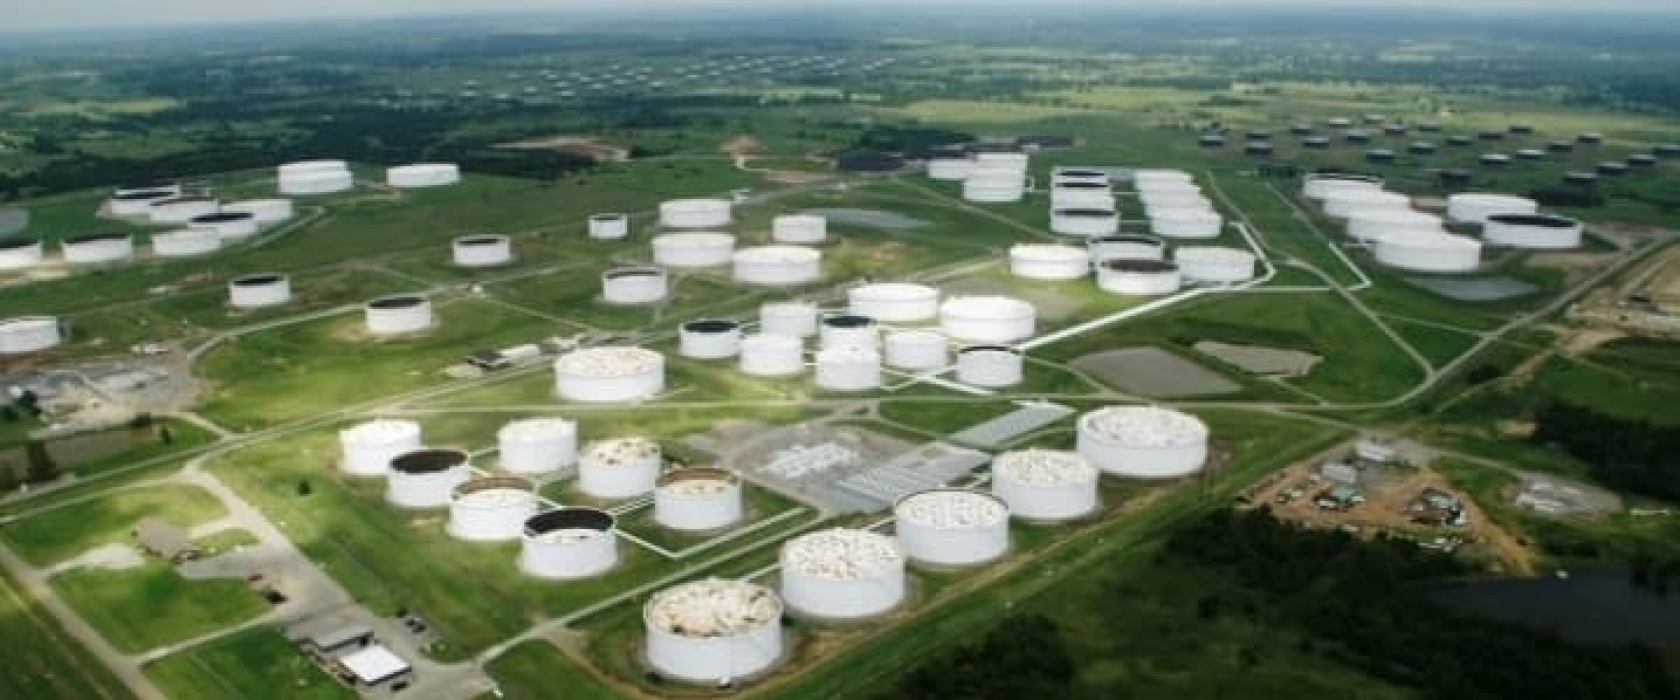 Is The Cushing Oil Hub Still Relevant? | OilPrice.com